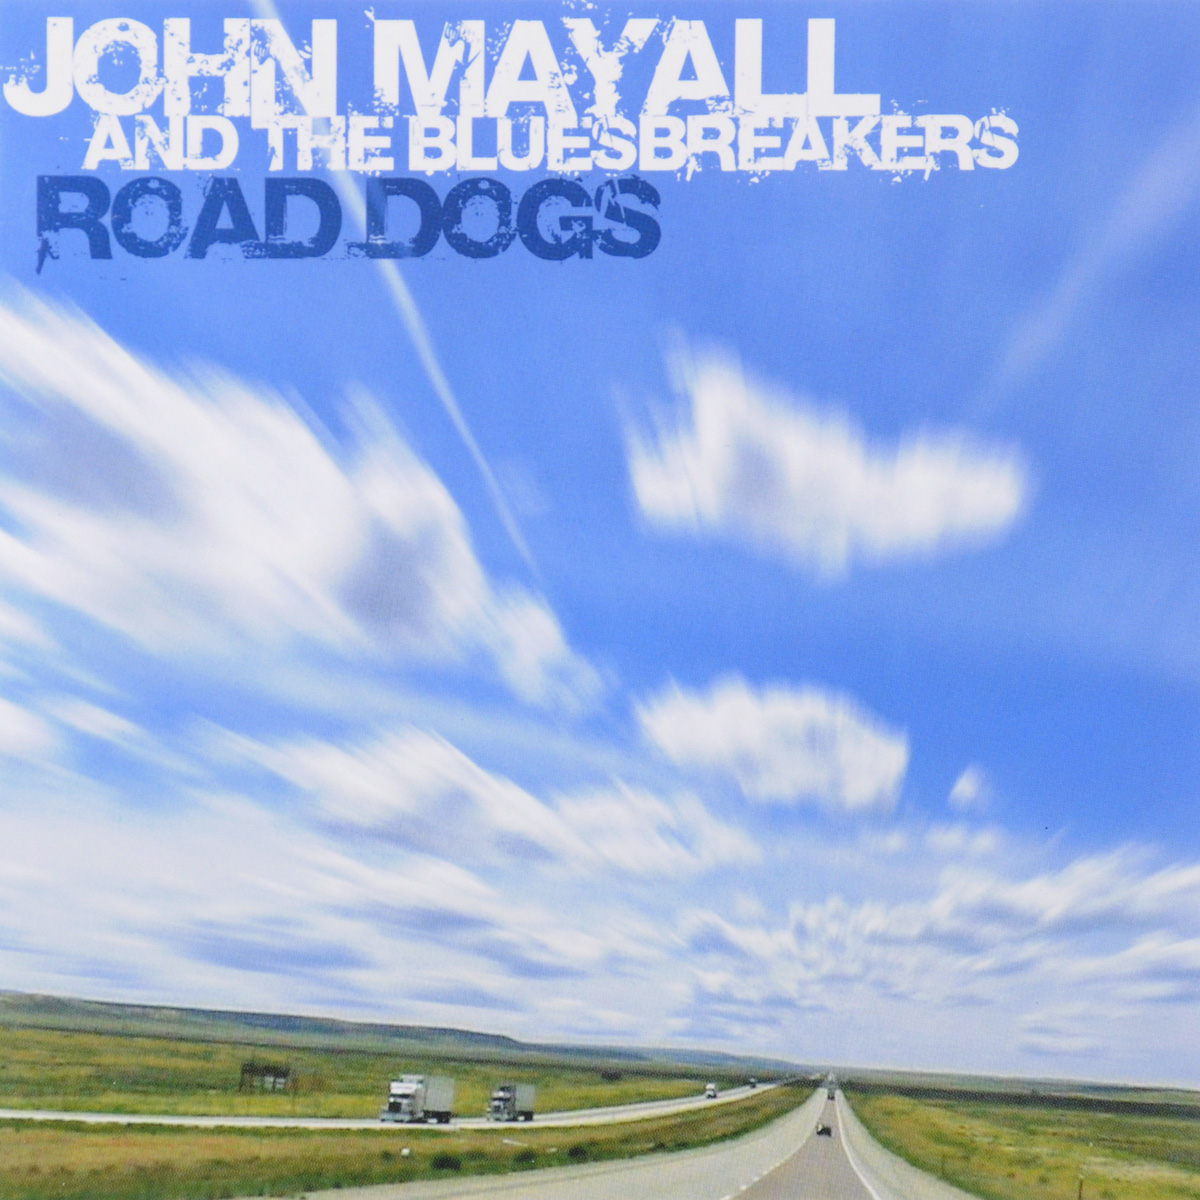 "Джон Мэйолл,""The Bluesbreakers"" John Mayall & The Bluesbreakers. Road Dogs"